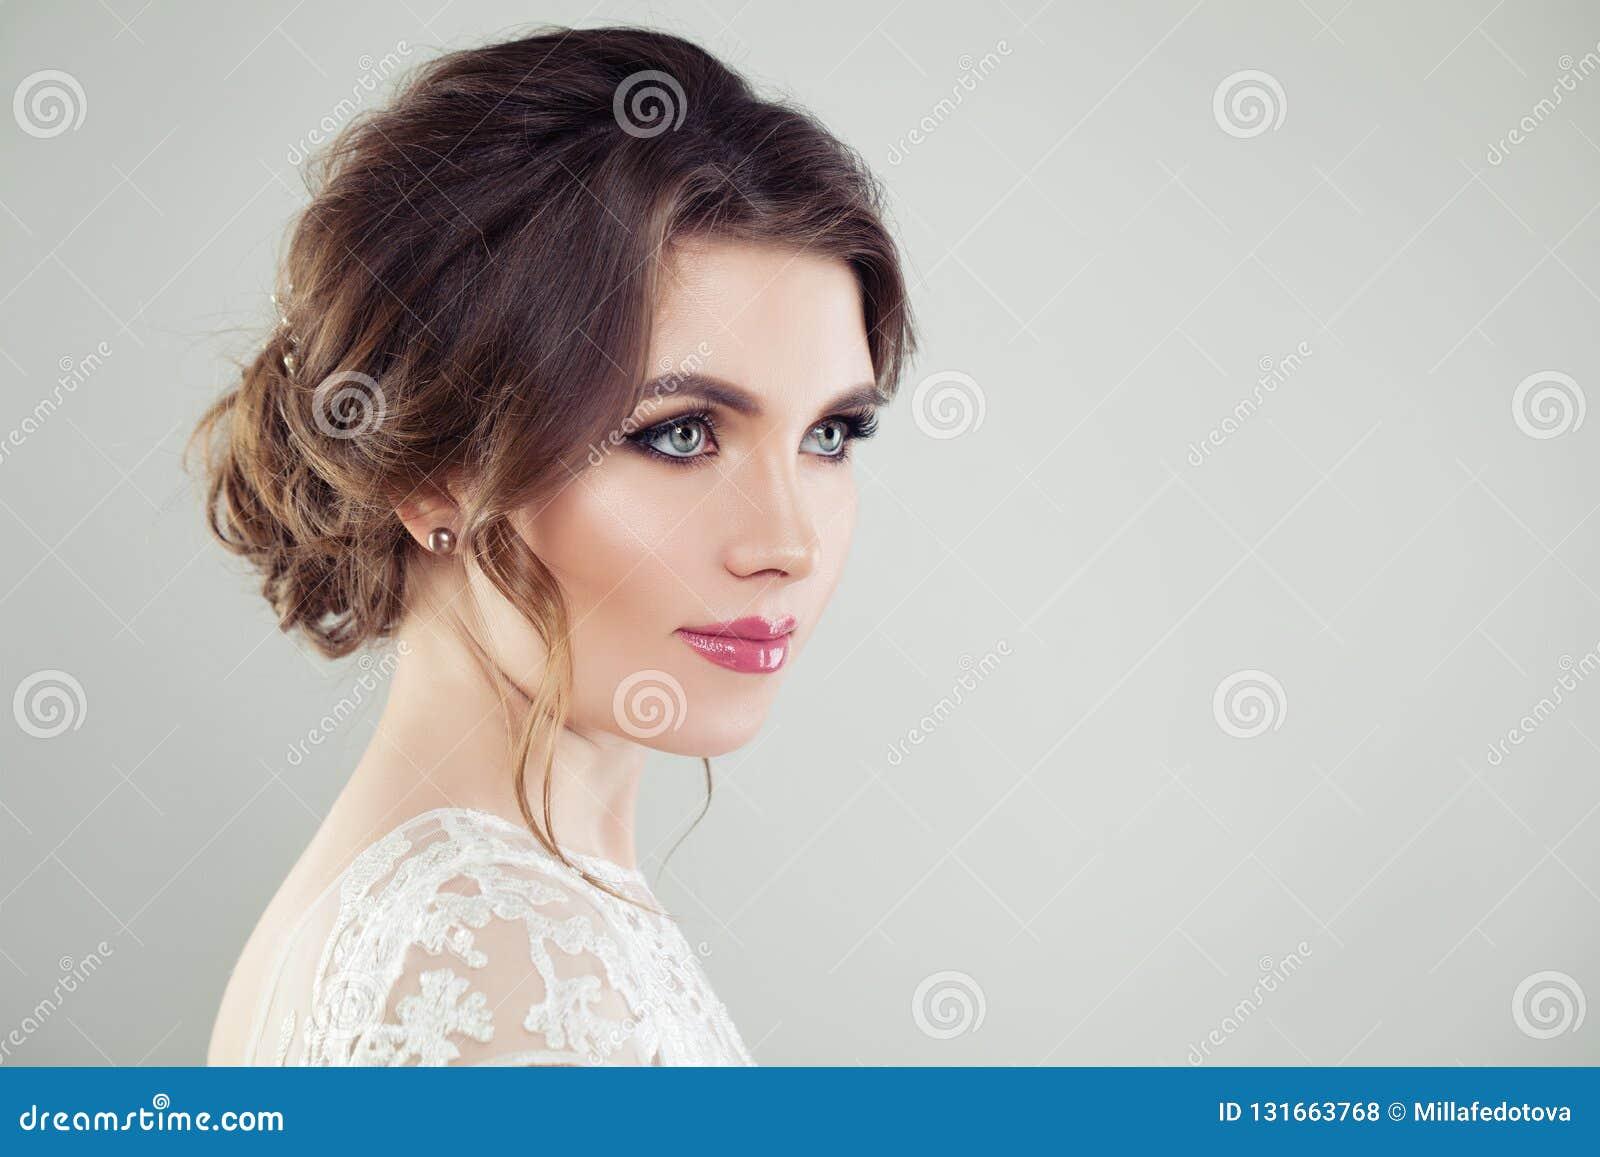 Beau visage femelle